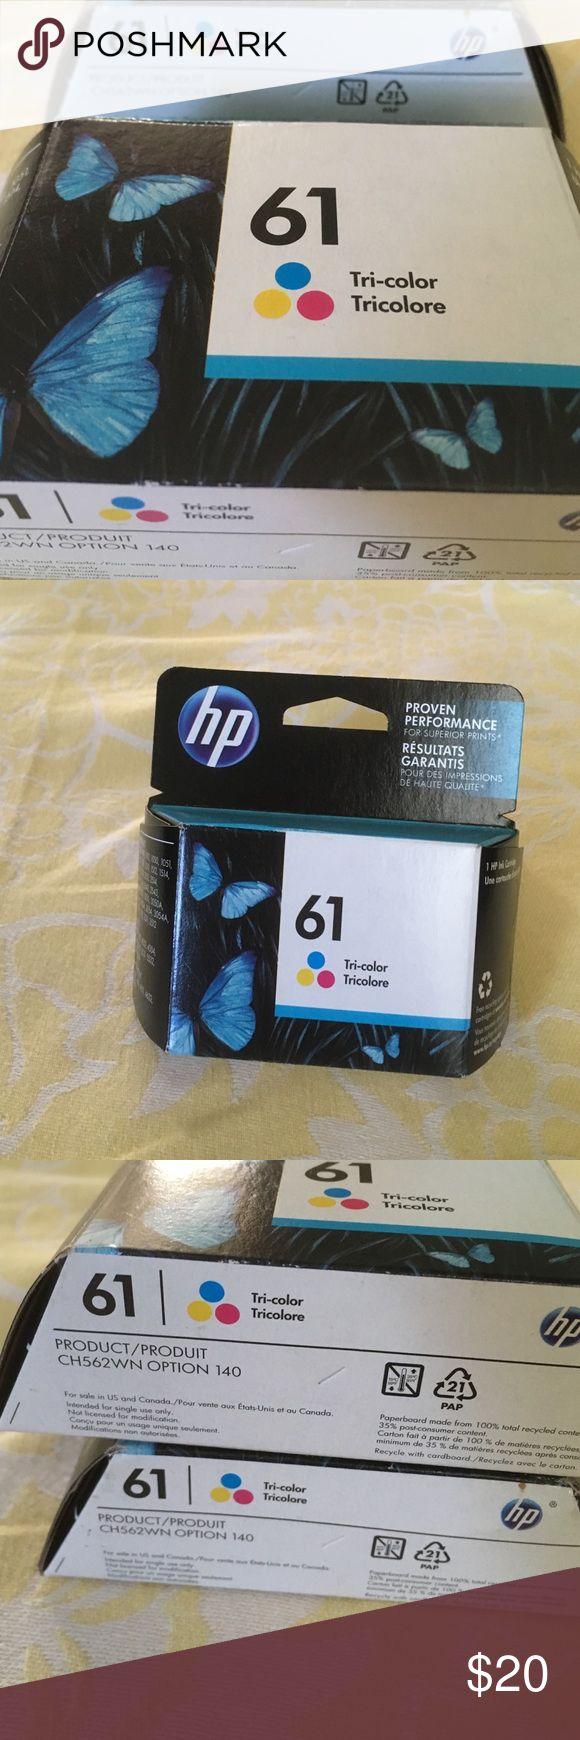 Printer ink HP. 61. Tri- color ink cartridges  2 packs  never opened   Exp date  Jan 2017 H P Accessories